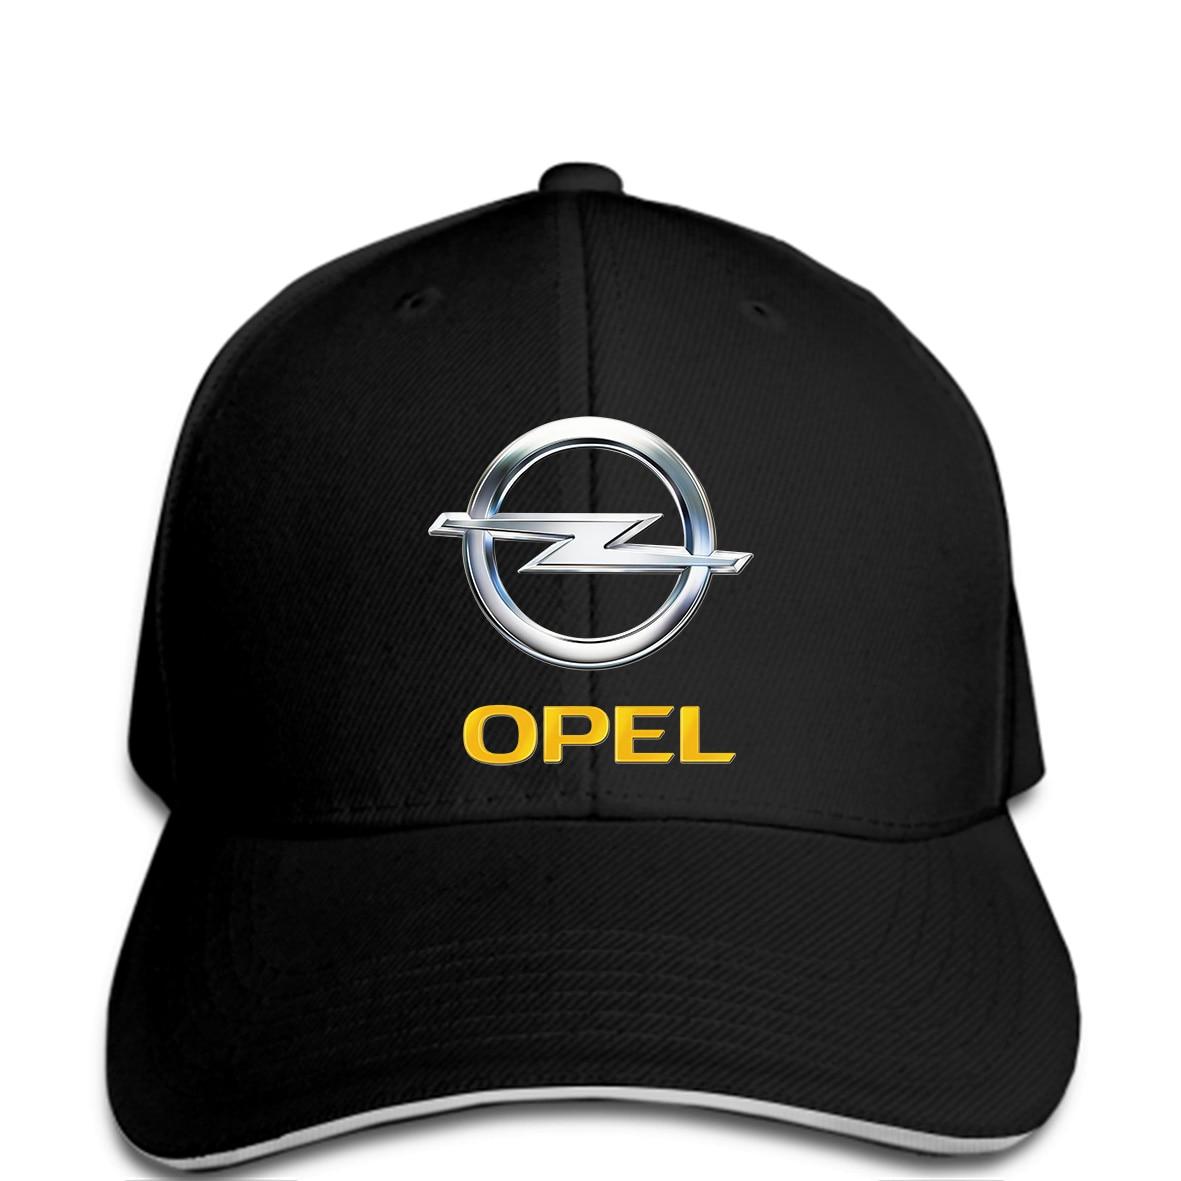 hight resolution of men baseball cap opel logo cars fashion funny hat novelty tsnapback women in baseball caps from men s clothing accessories on aliexpress com alibaba